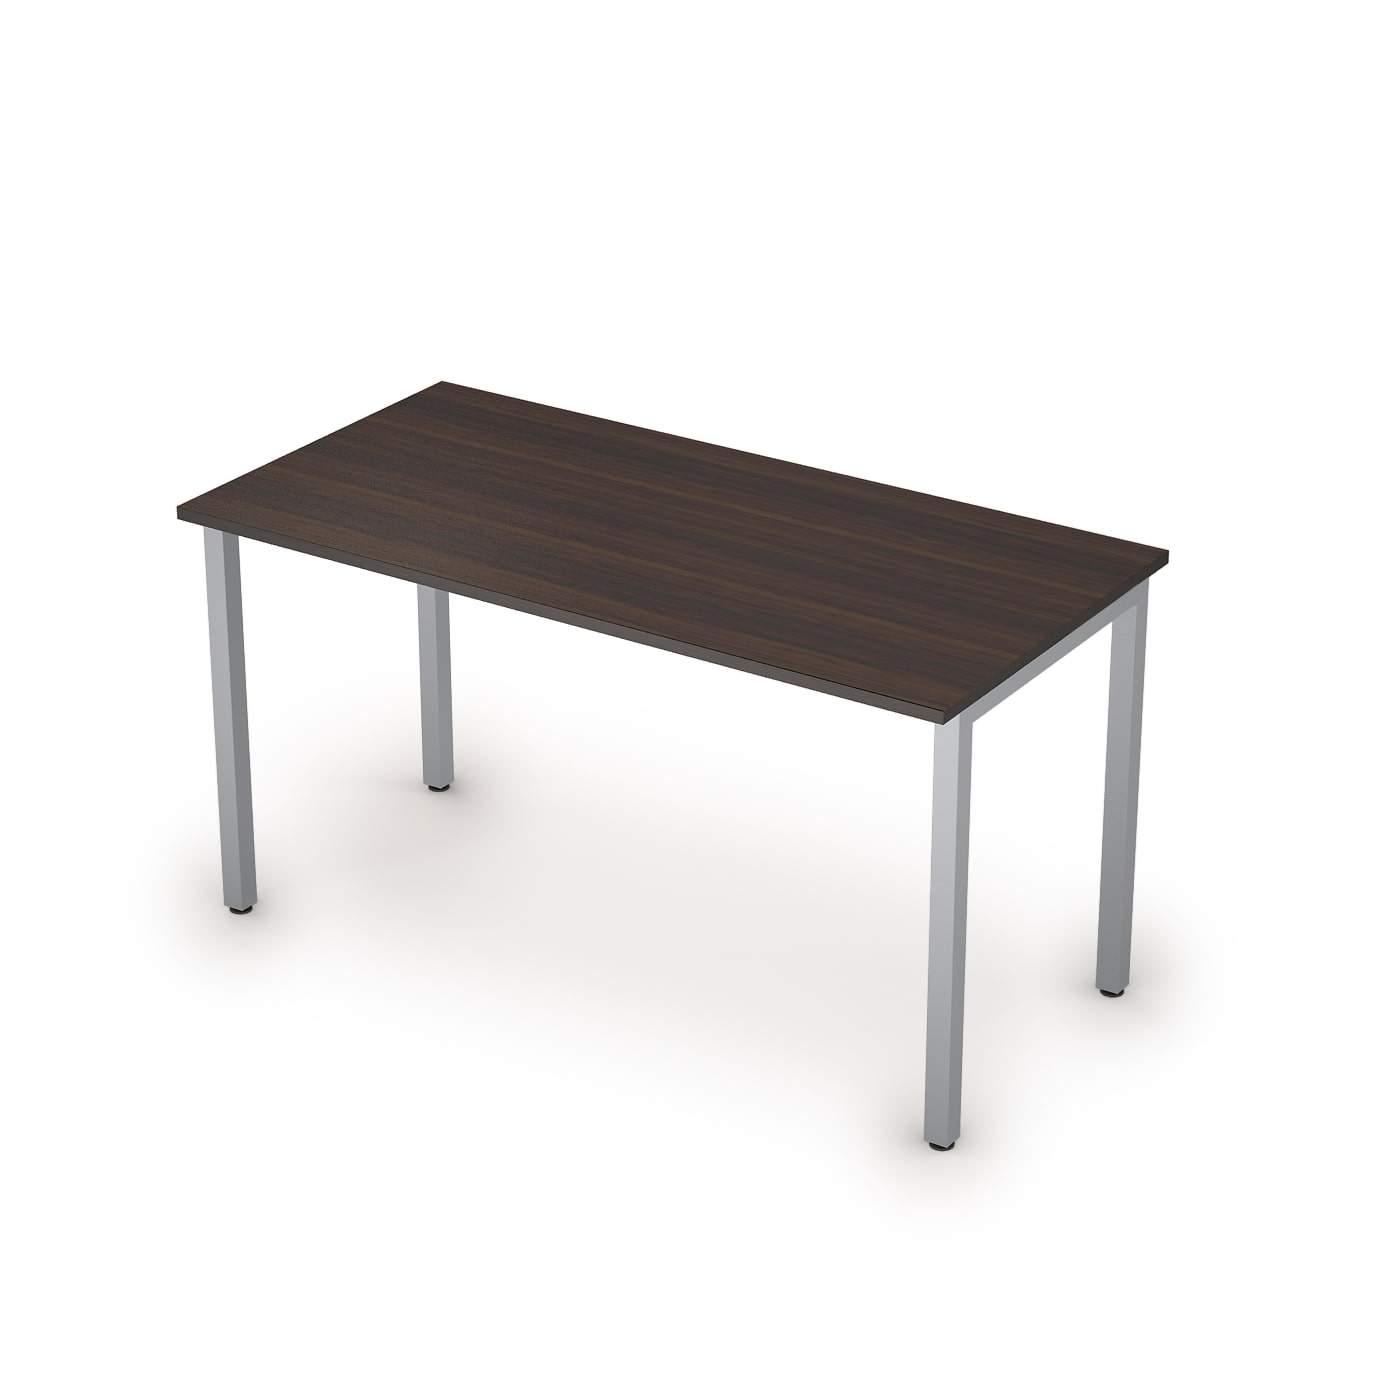 Столы на металлических опорах без экрана  1400х700х750